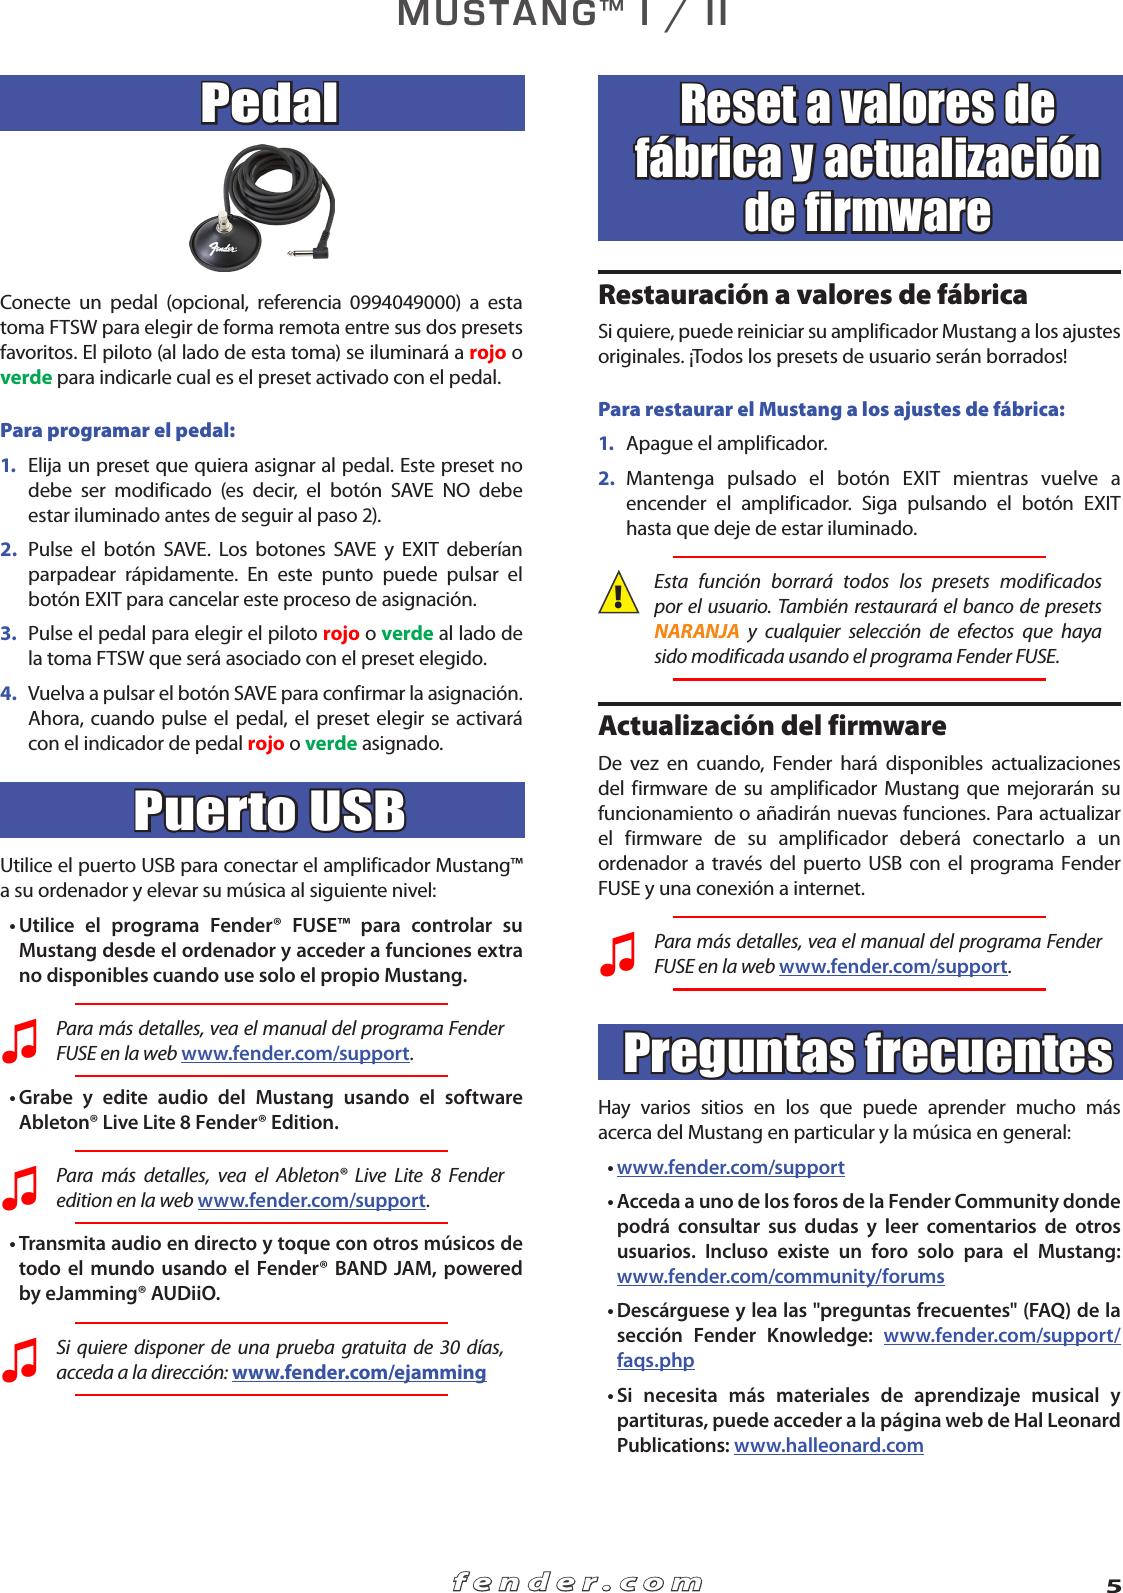 Fender Mustang I_II_advanced_manual_Spanish I II Advanced